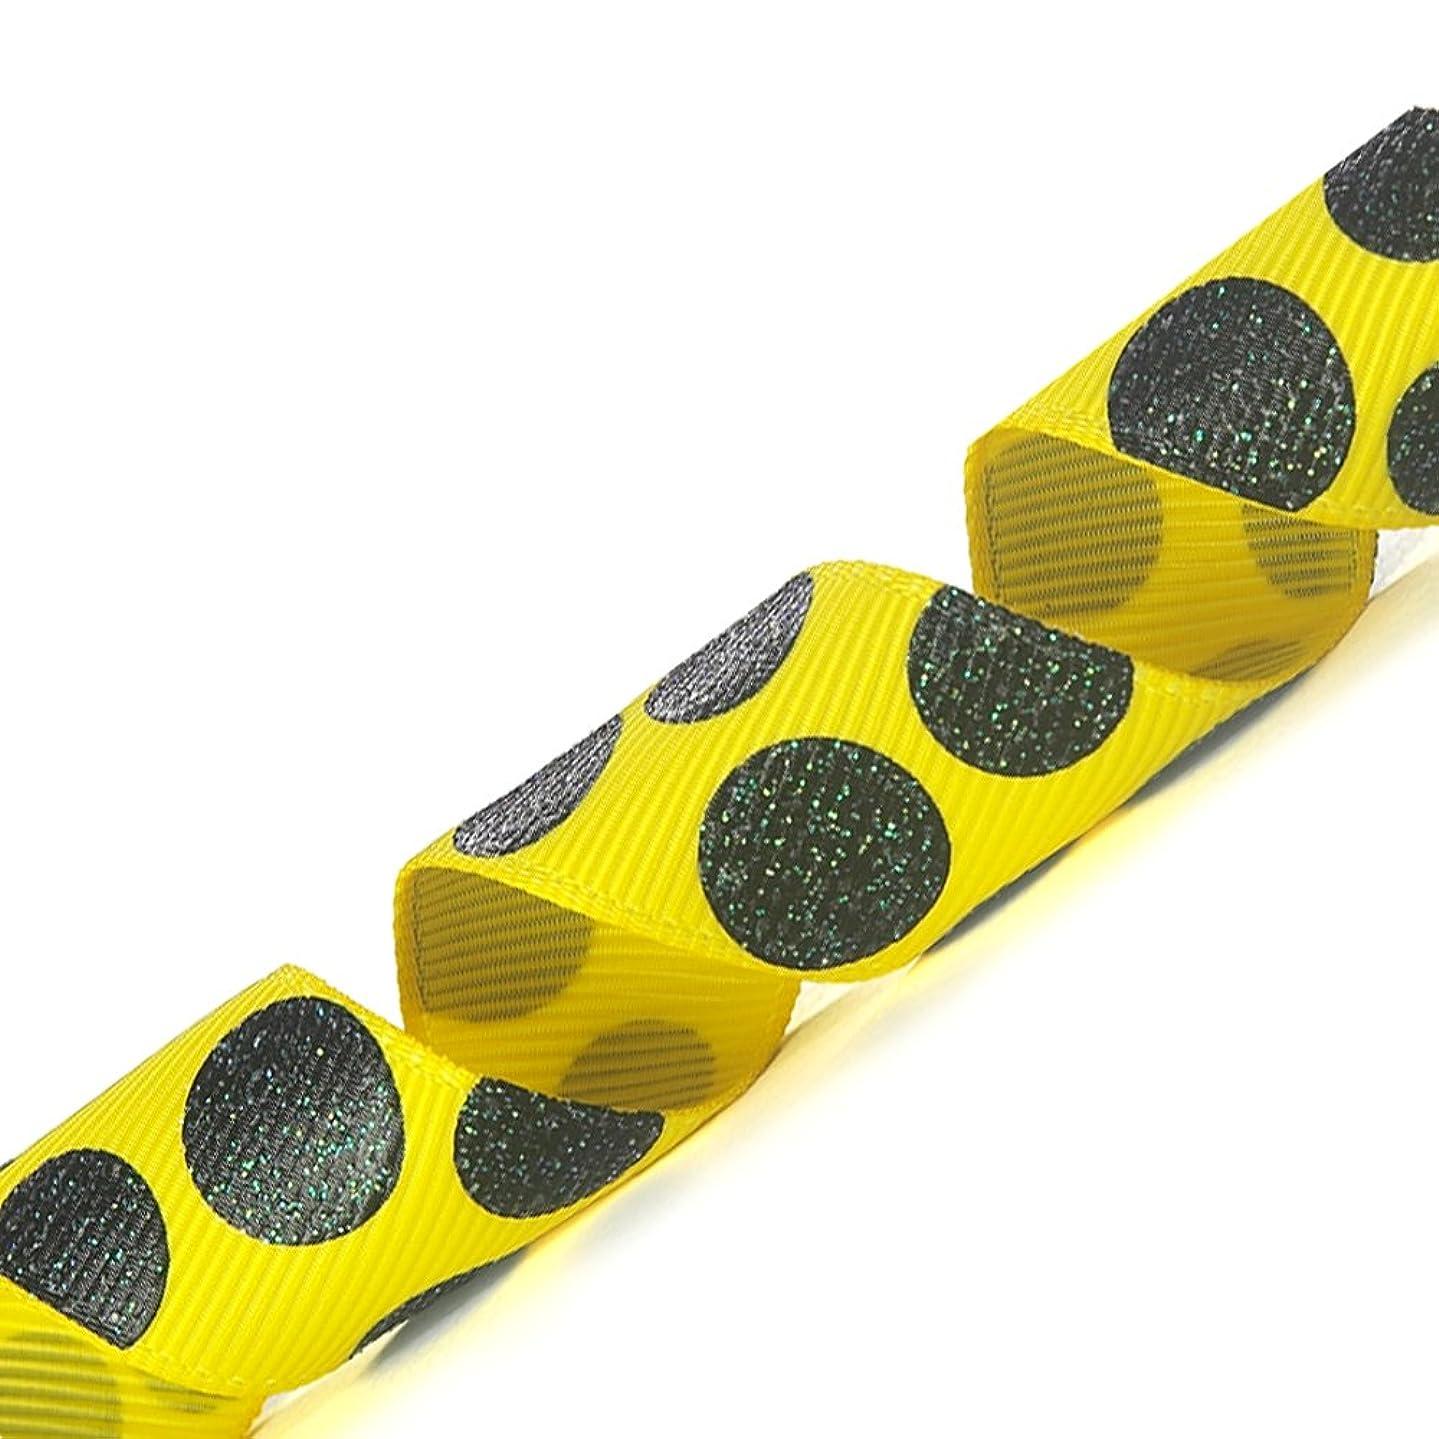 Morex Ribbon Sugar Dots Glitter Grosgrain Ribbon, 7/8-Inch by 20-Yard, Daffodil/Black